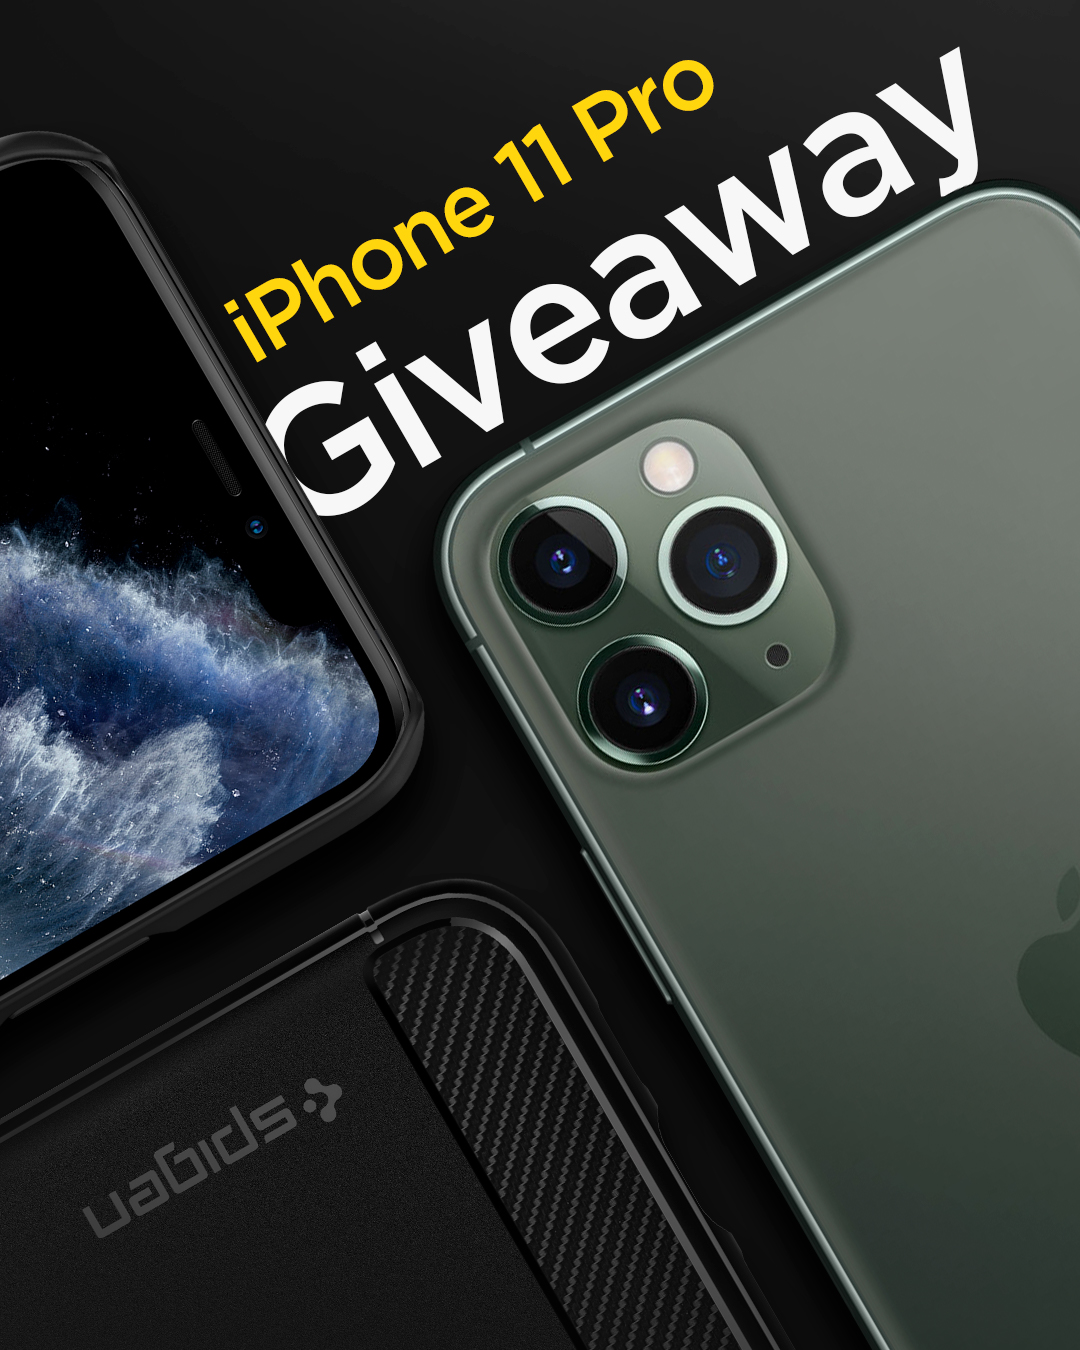 Spigen Canada iPhone 11 Pro Giveaway Image